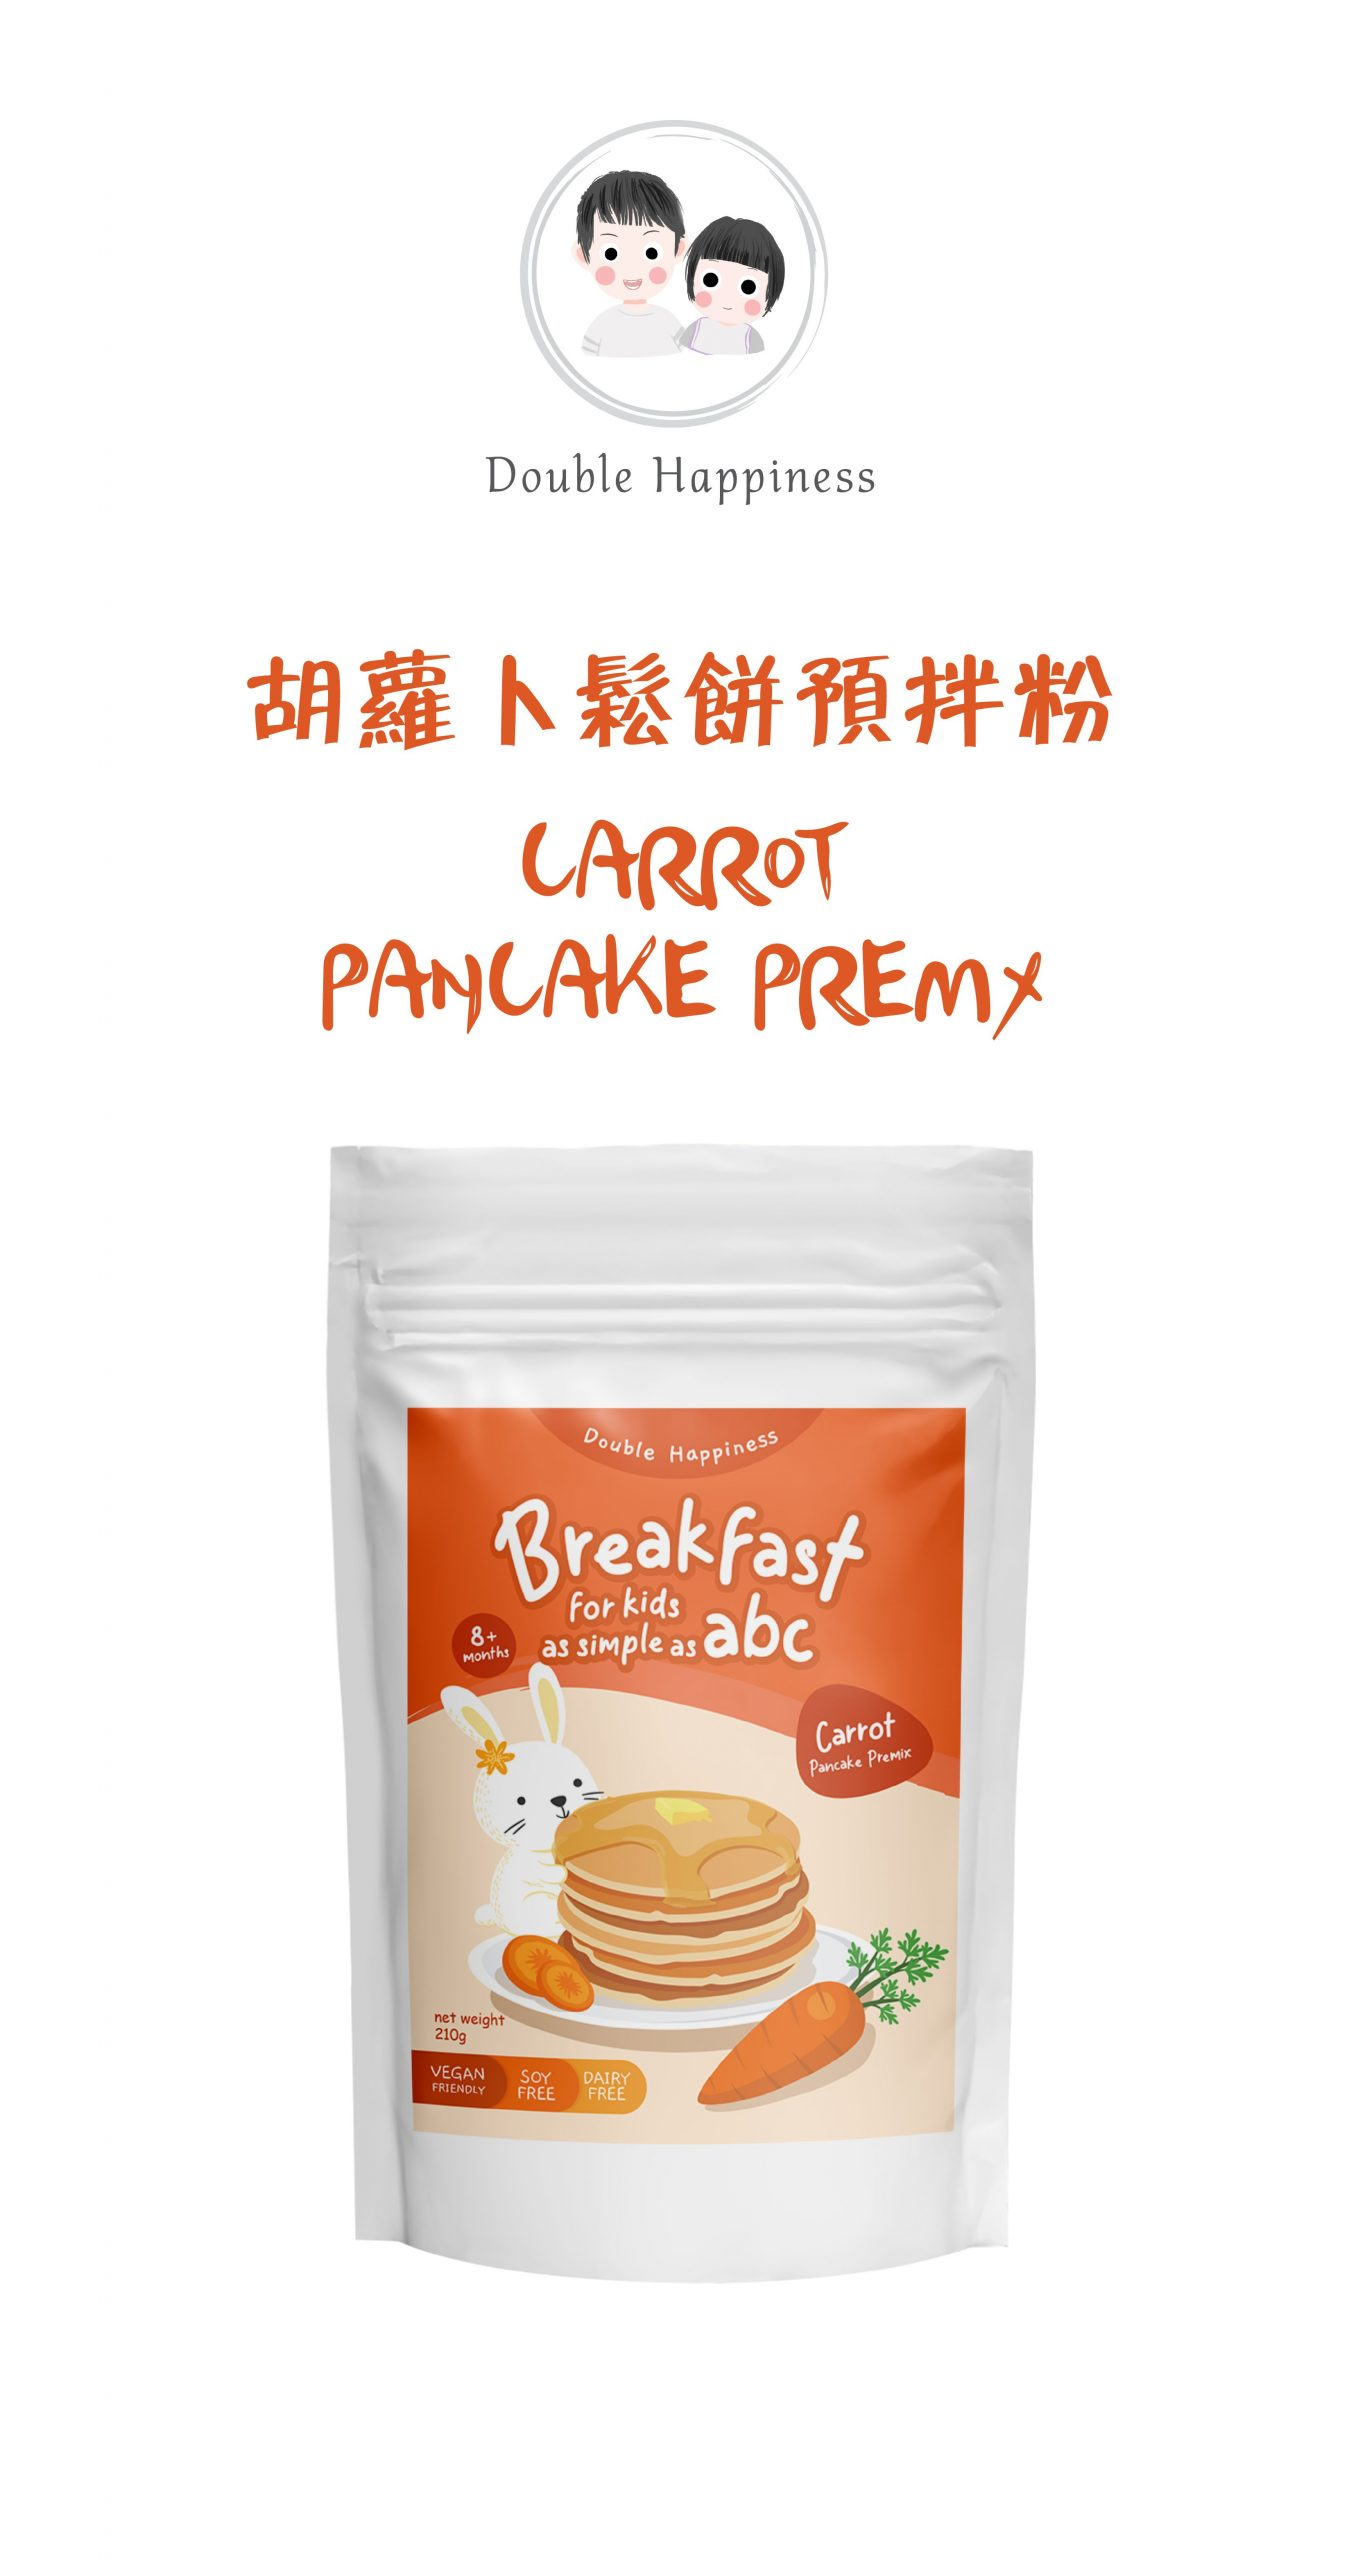 Carrot Pancake Premix